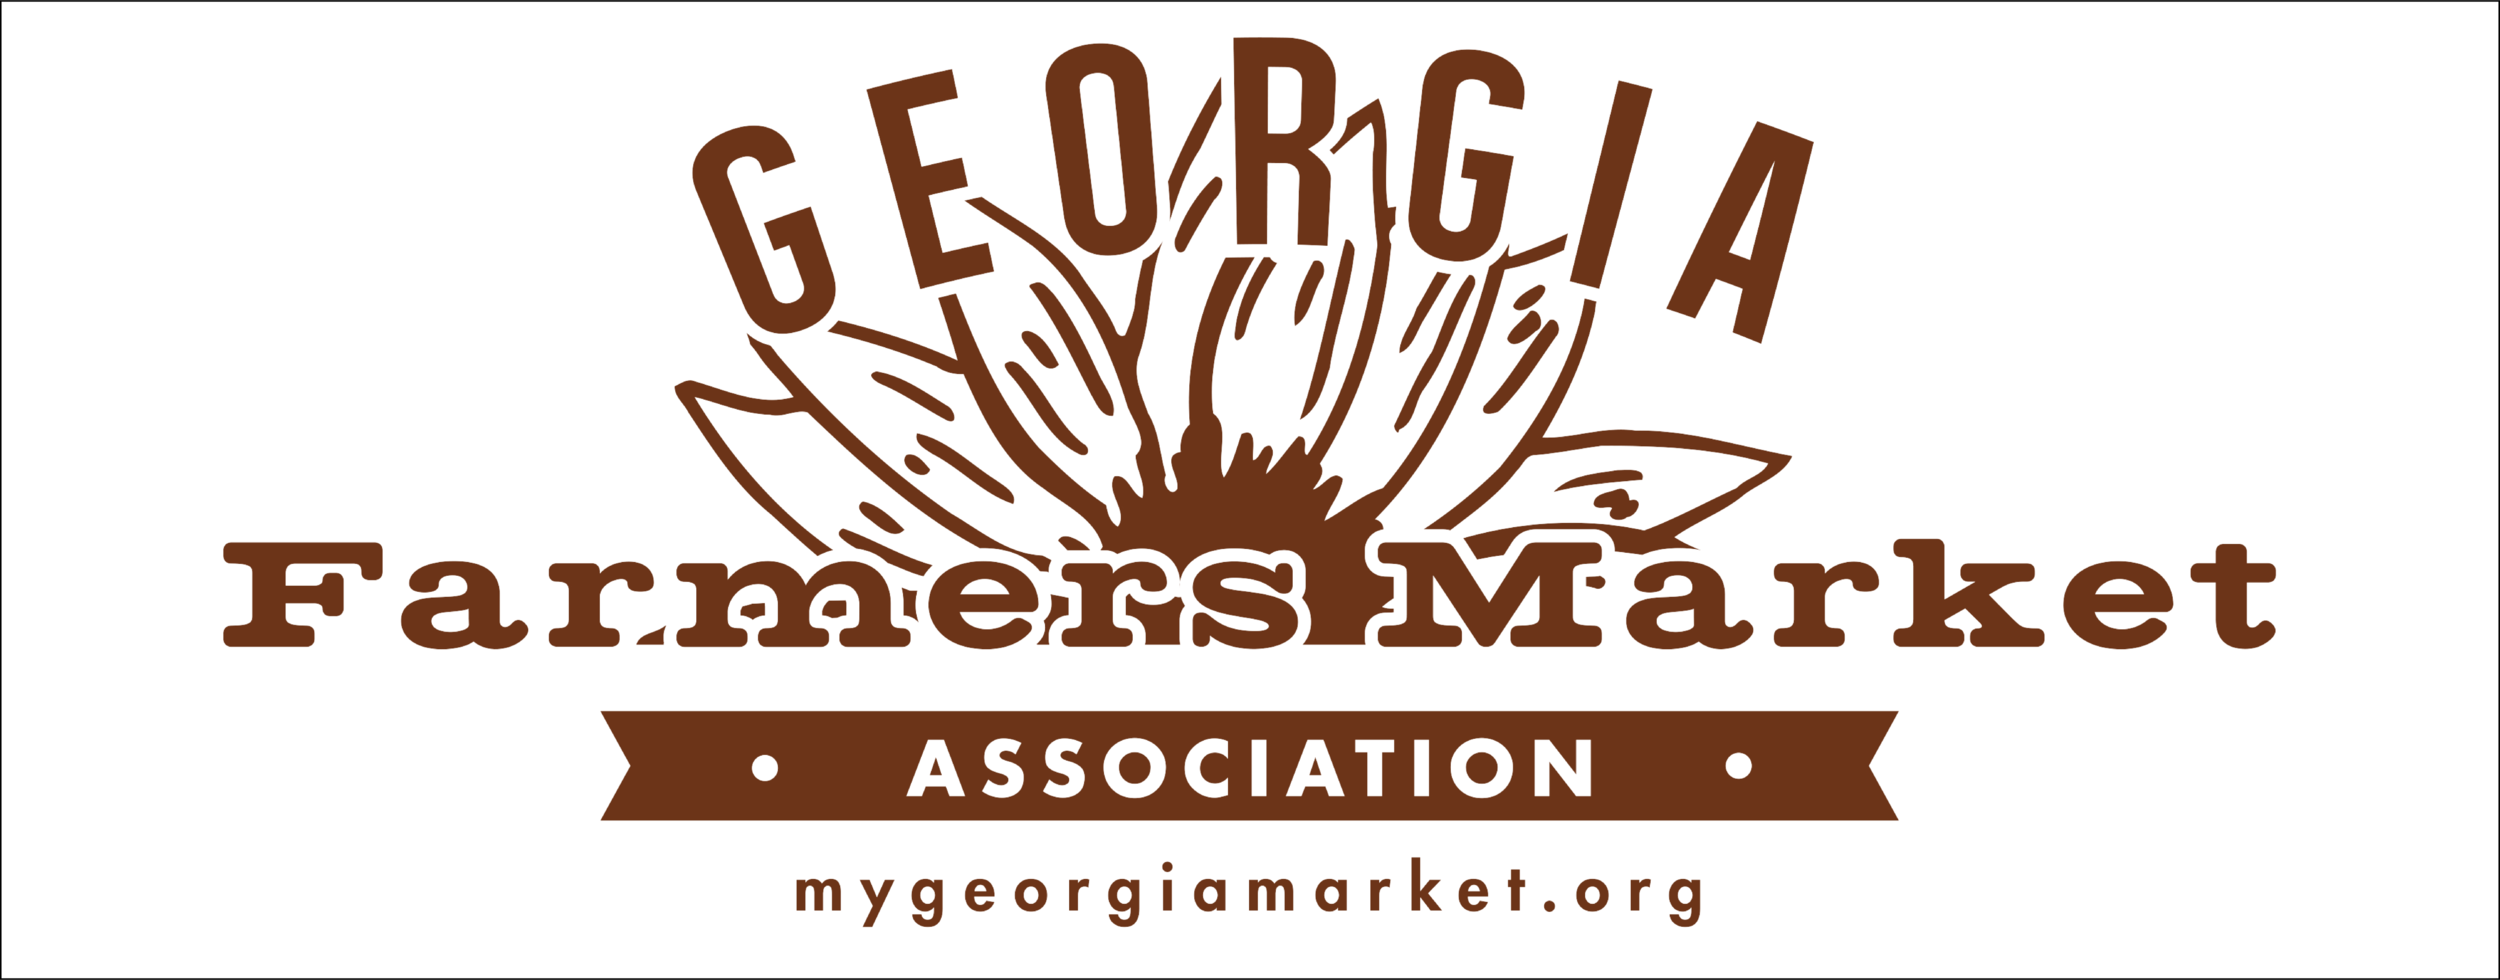 Glennville Farmers Market   4-8pm Tuesday's May-July  123 East Barnard Street Glennville GA, 30427  Contact: Jessica Kennedy  jessicamkennedy89@yahoo.com